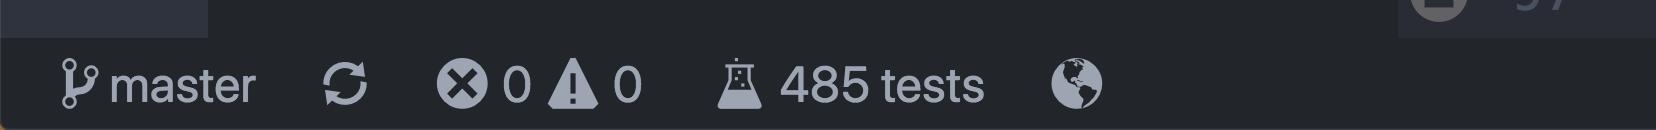 A screenshot of the status bar item